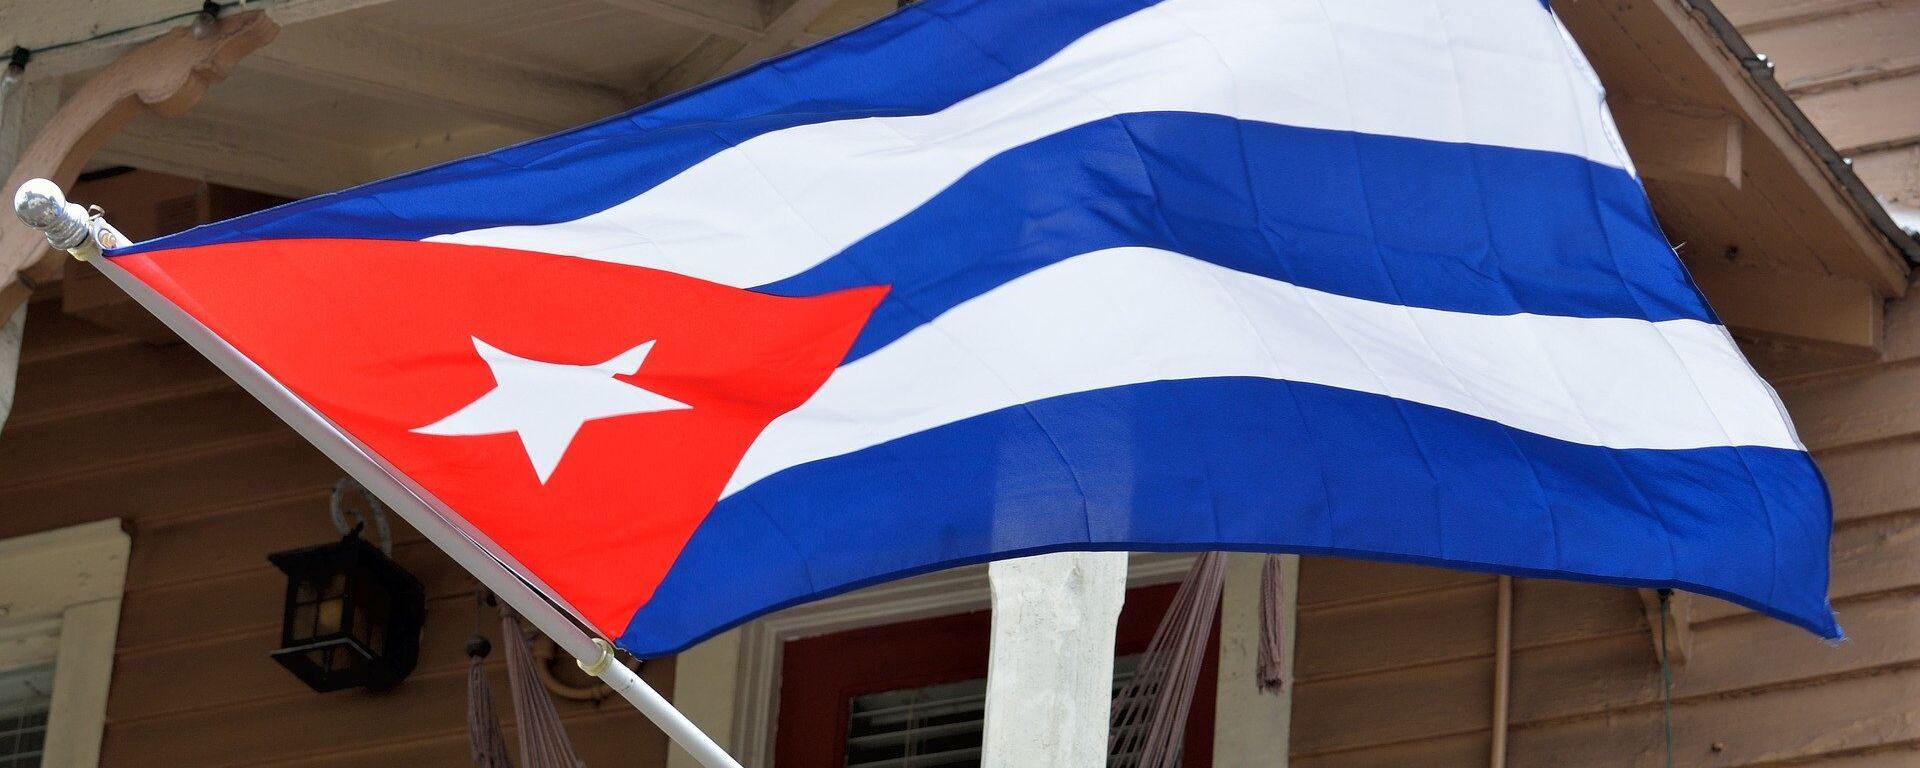 La bandera de Cuba - Sputnik Mundo, 1920, 12.01.2021